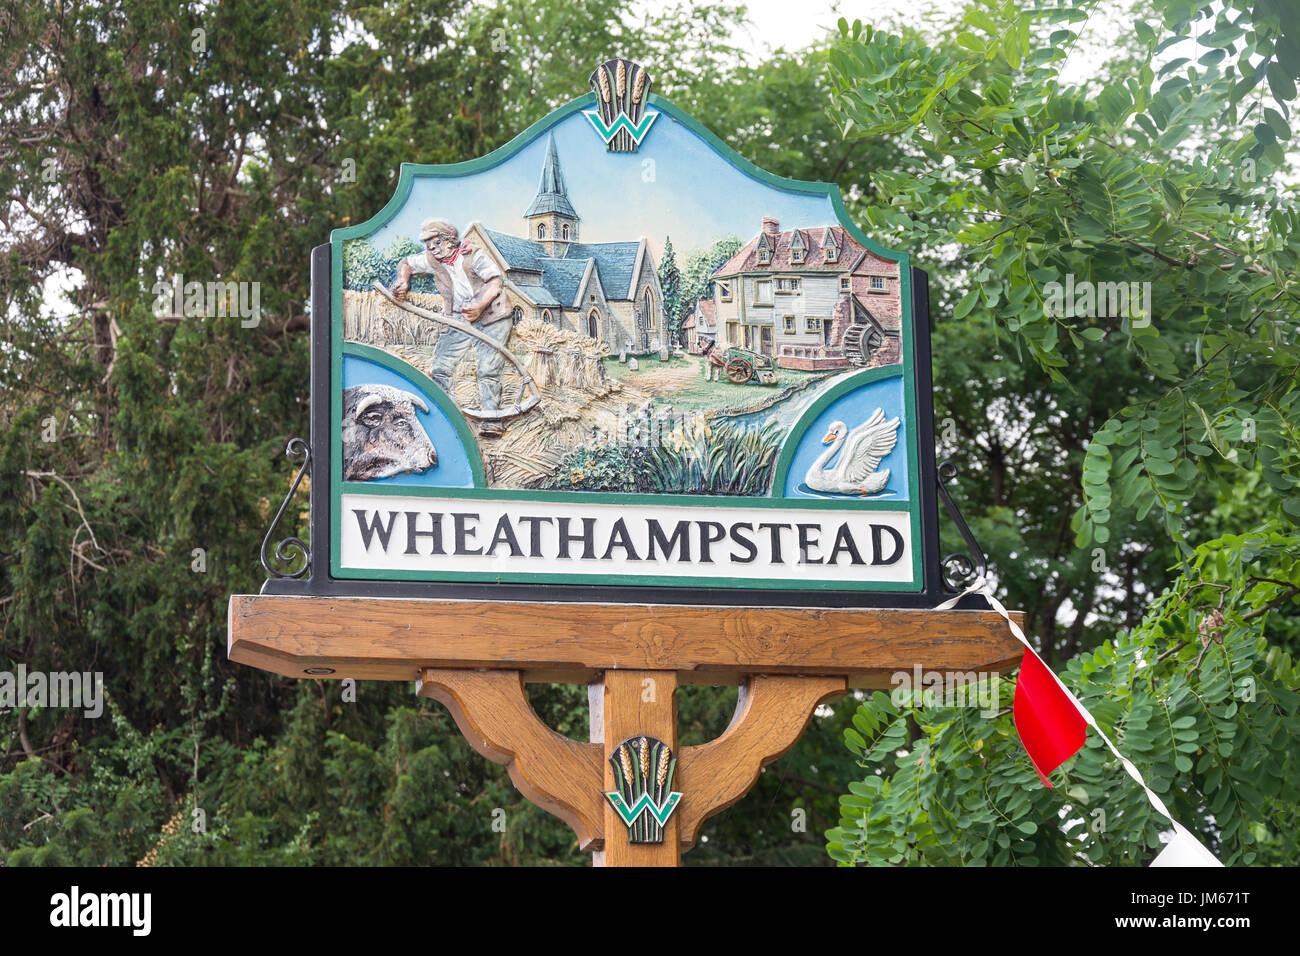 Wheathampstead Village sign, High Street, Wheathampstead, Hertfordshire, England, United Kingdom - Stock Image